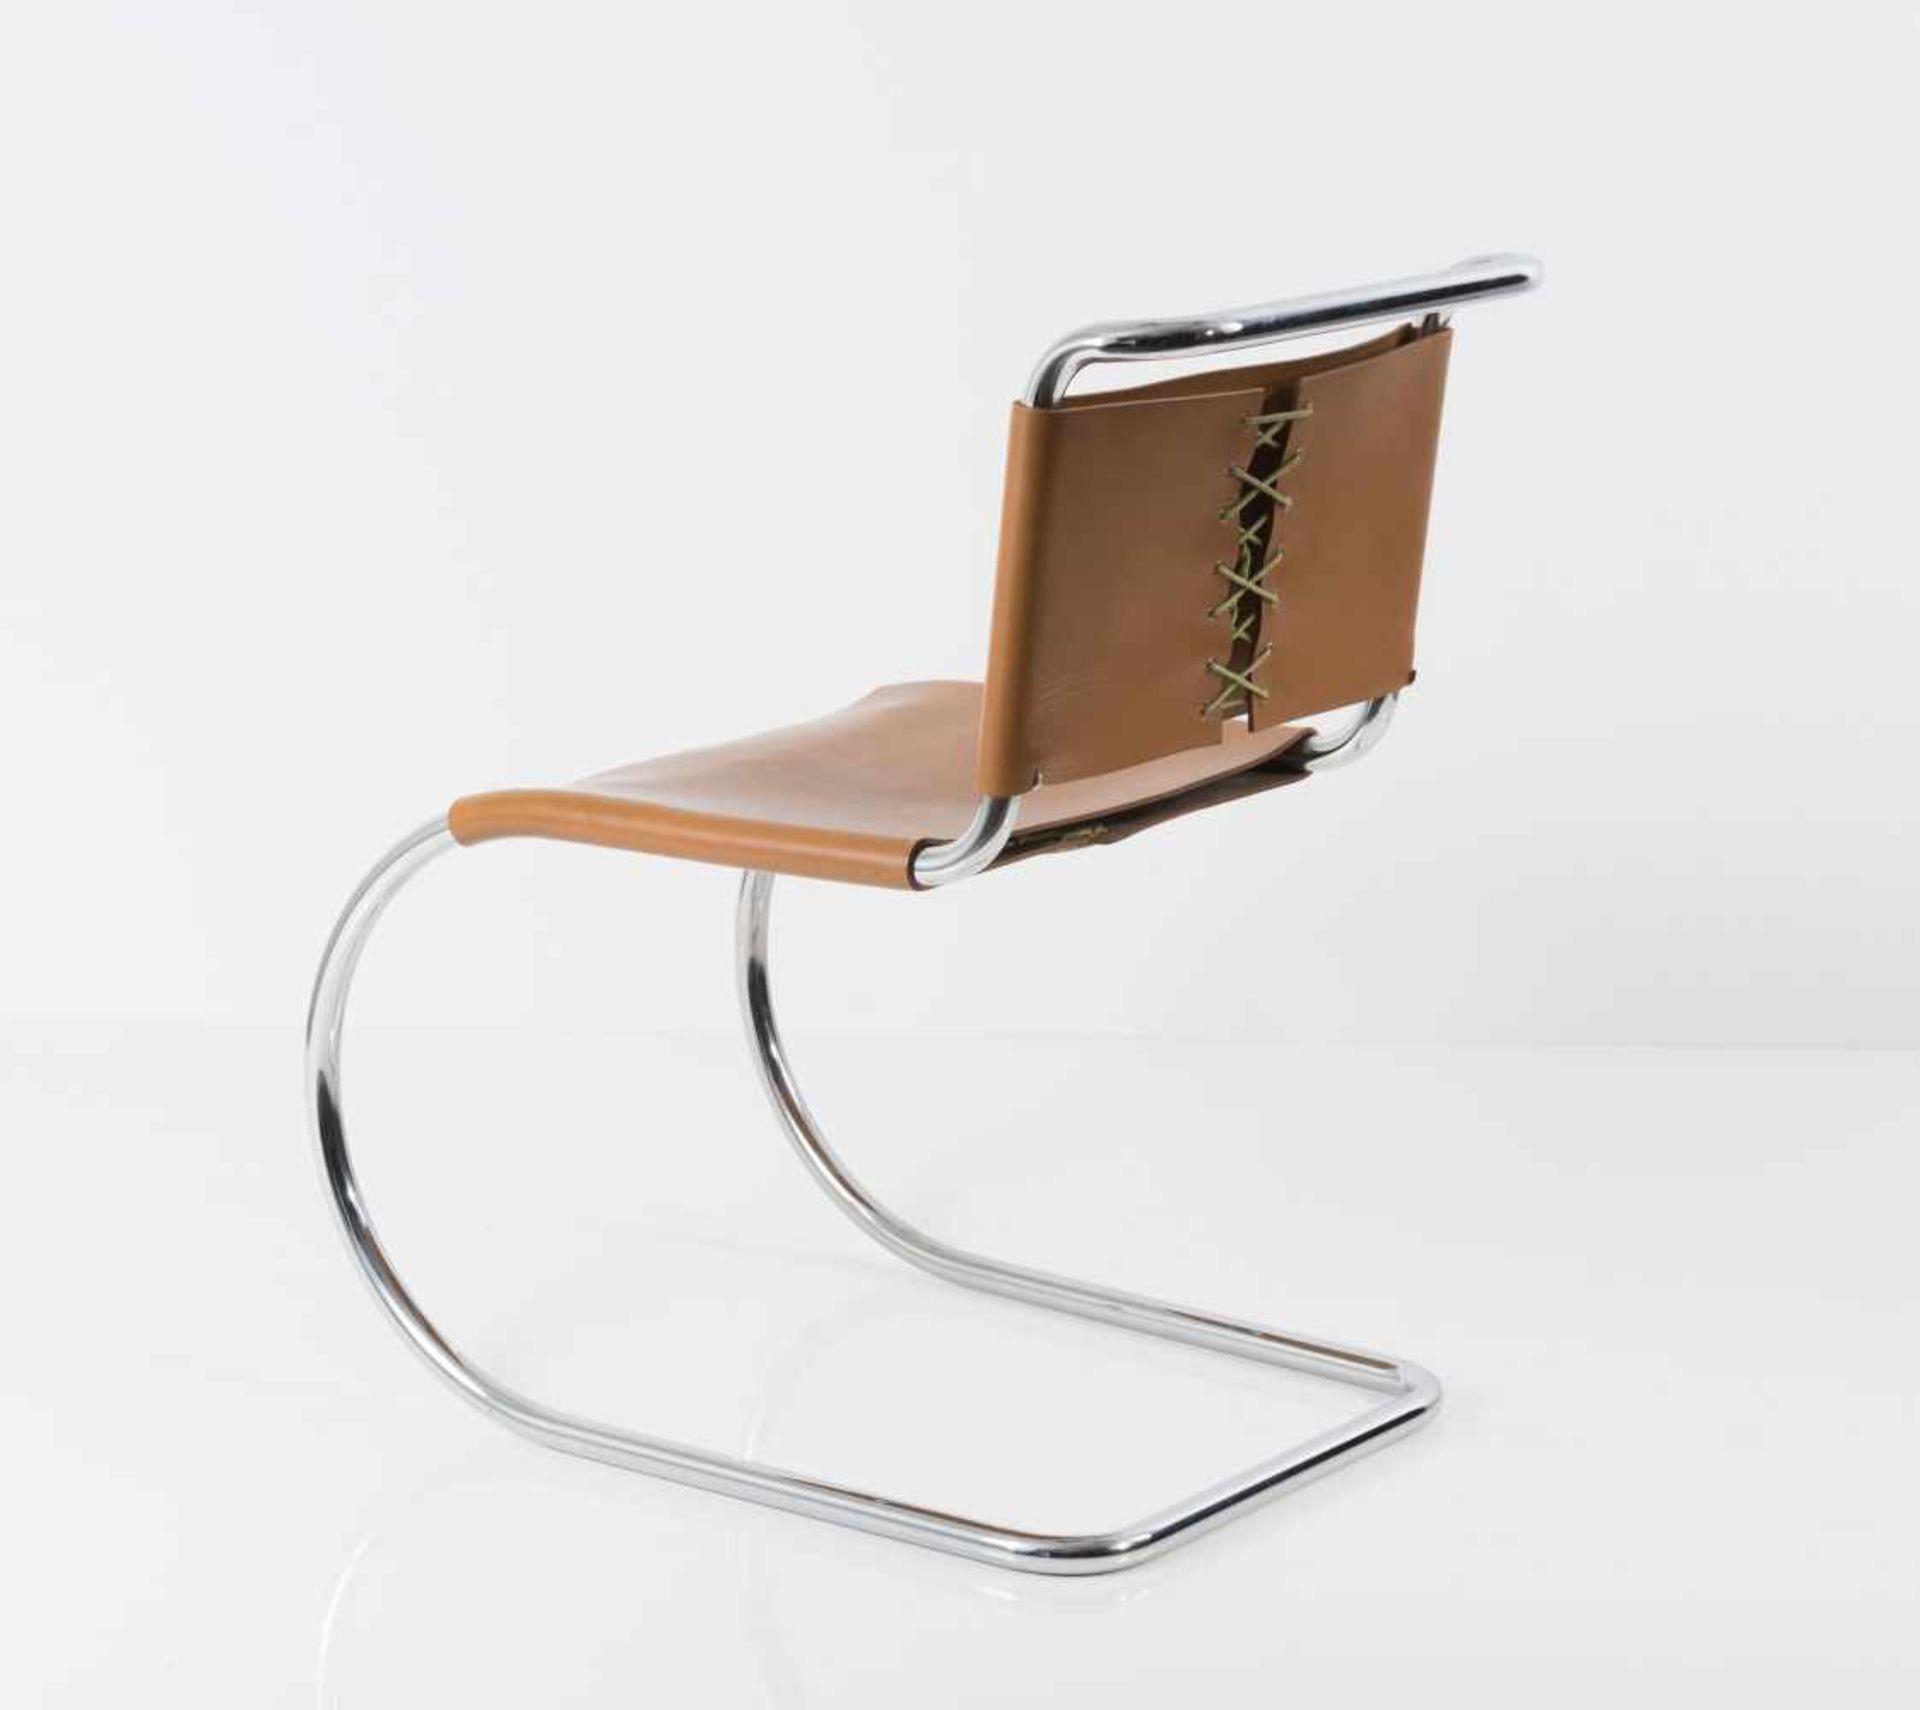 Ludwig Mies van der Rohe Sechs Stühle 'MR 10', 1927 H. 79 x 49 x 71 cm. Knoll International, New - Bild 2 aus 5